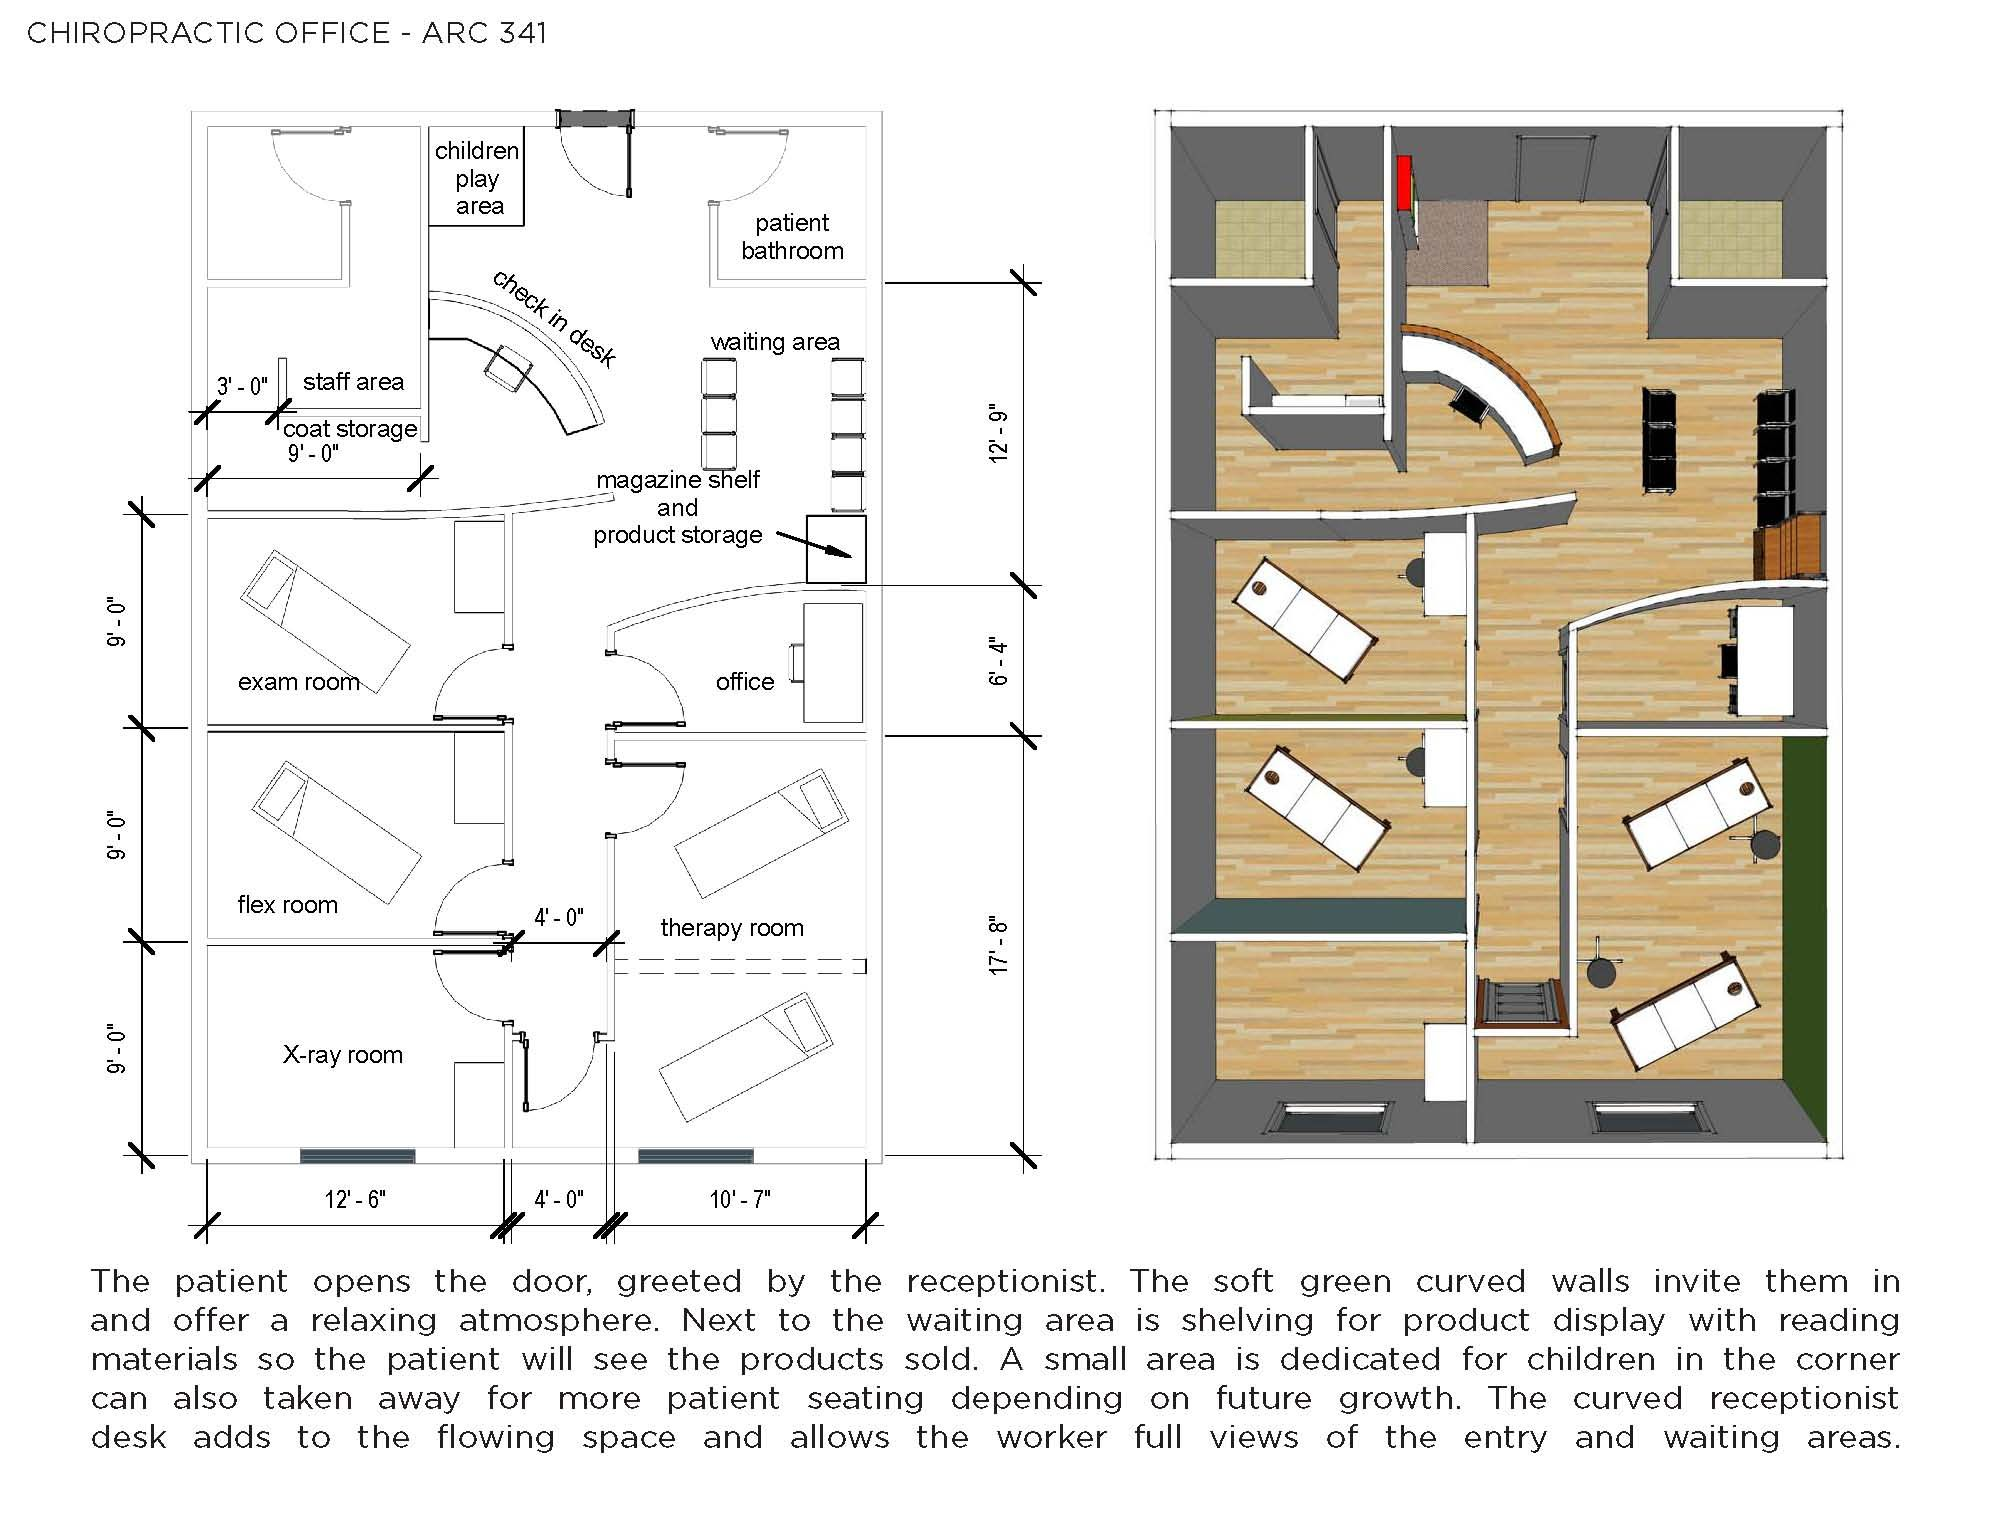 Chiropractic office design bing images chiropractic for Office blueprints design